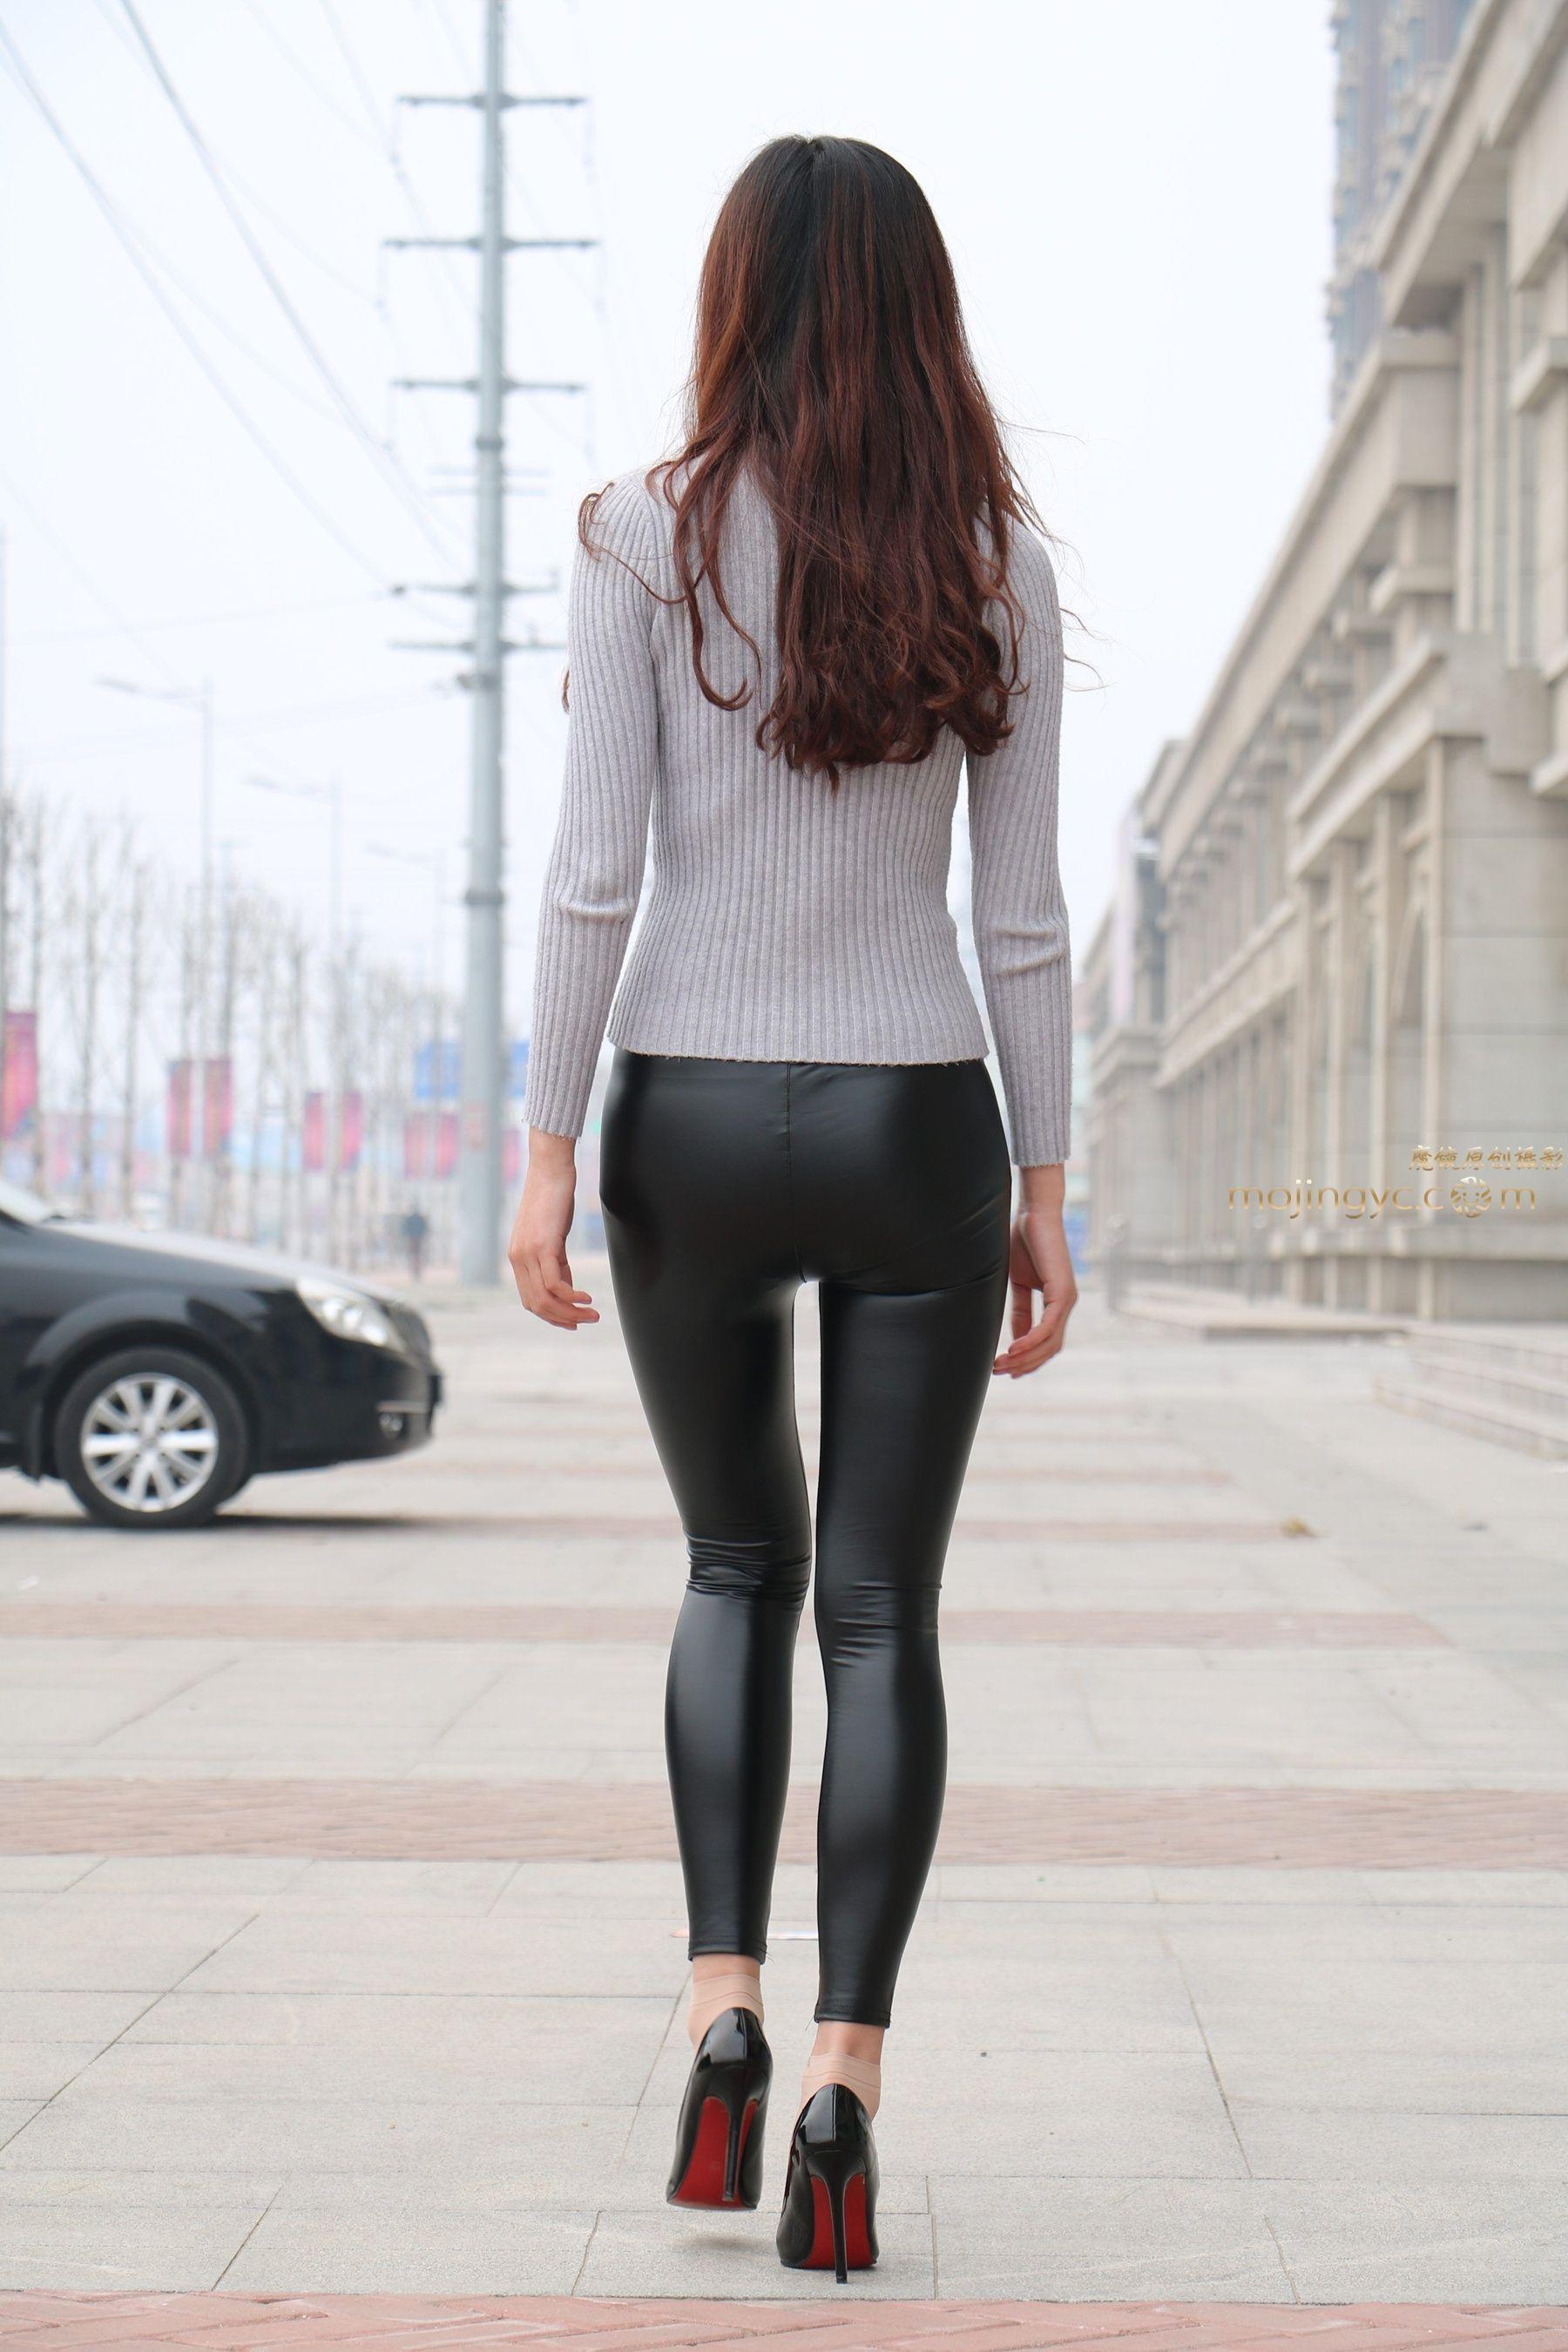 Shiny leggings candid Lena Meyer-Landrut - Stars for Free Berlin - Shiny Candid Celebs in Leggings  & Spandex